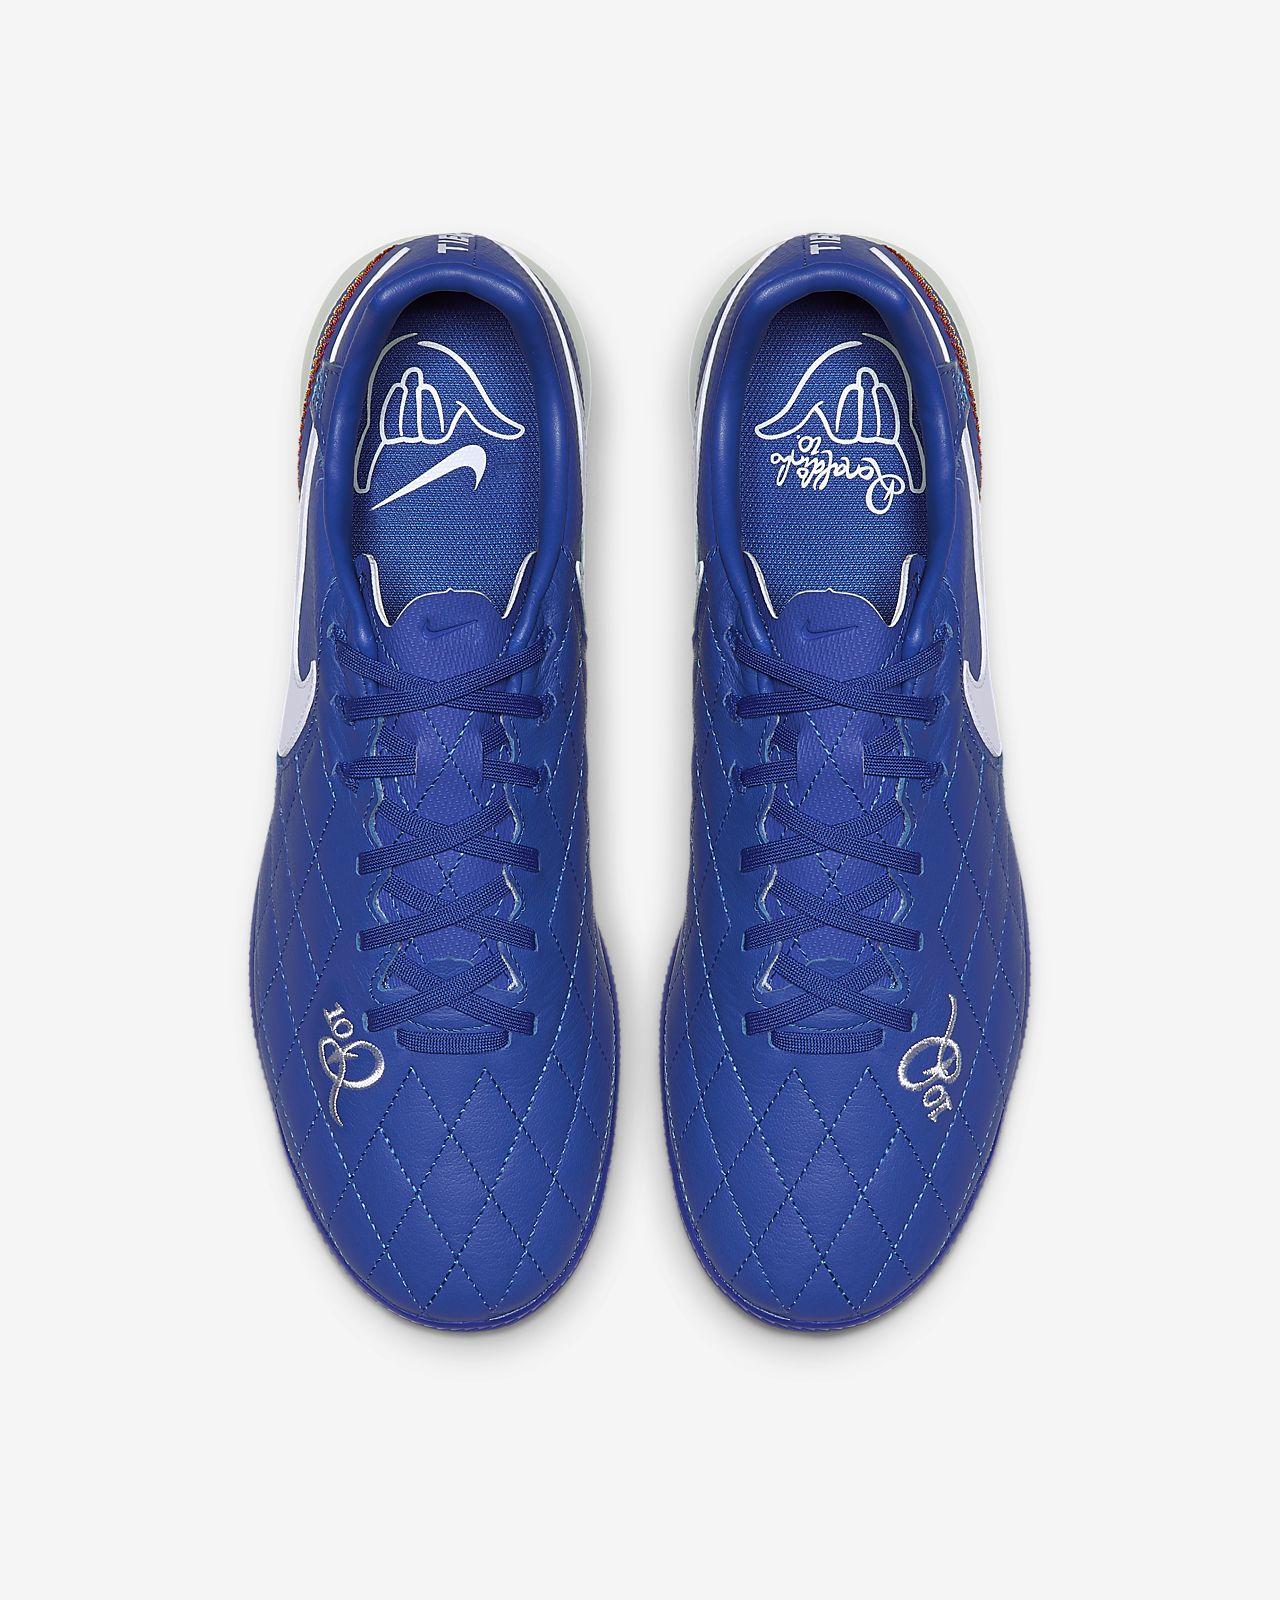 21930ecfa ... Nike TiempoX Lunar Legend VII Pro 10R Artificial-Turf Soccer Shoe